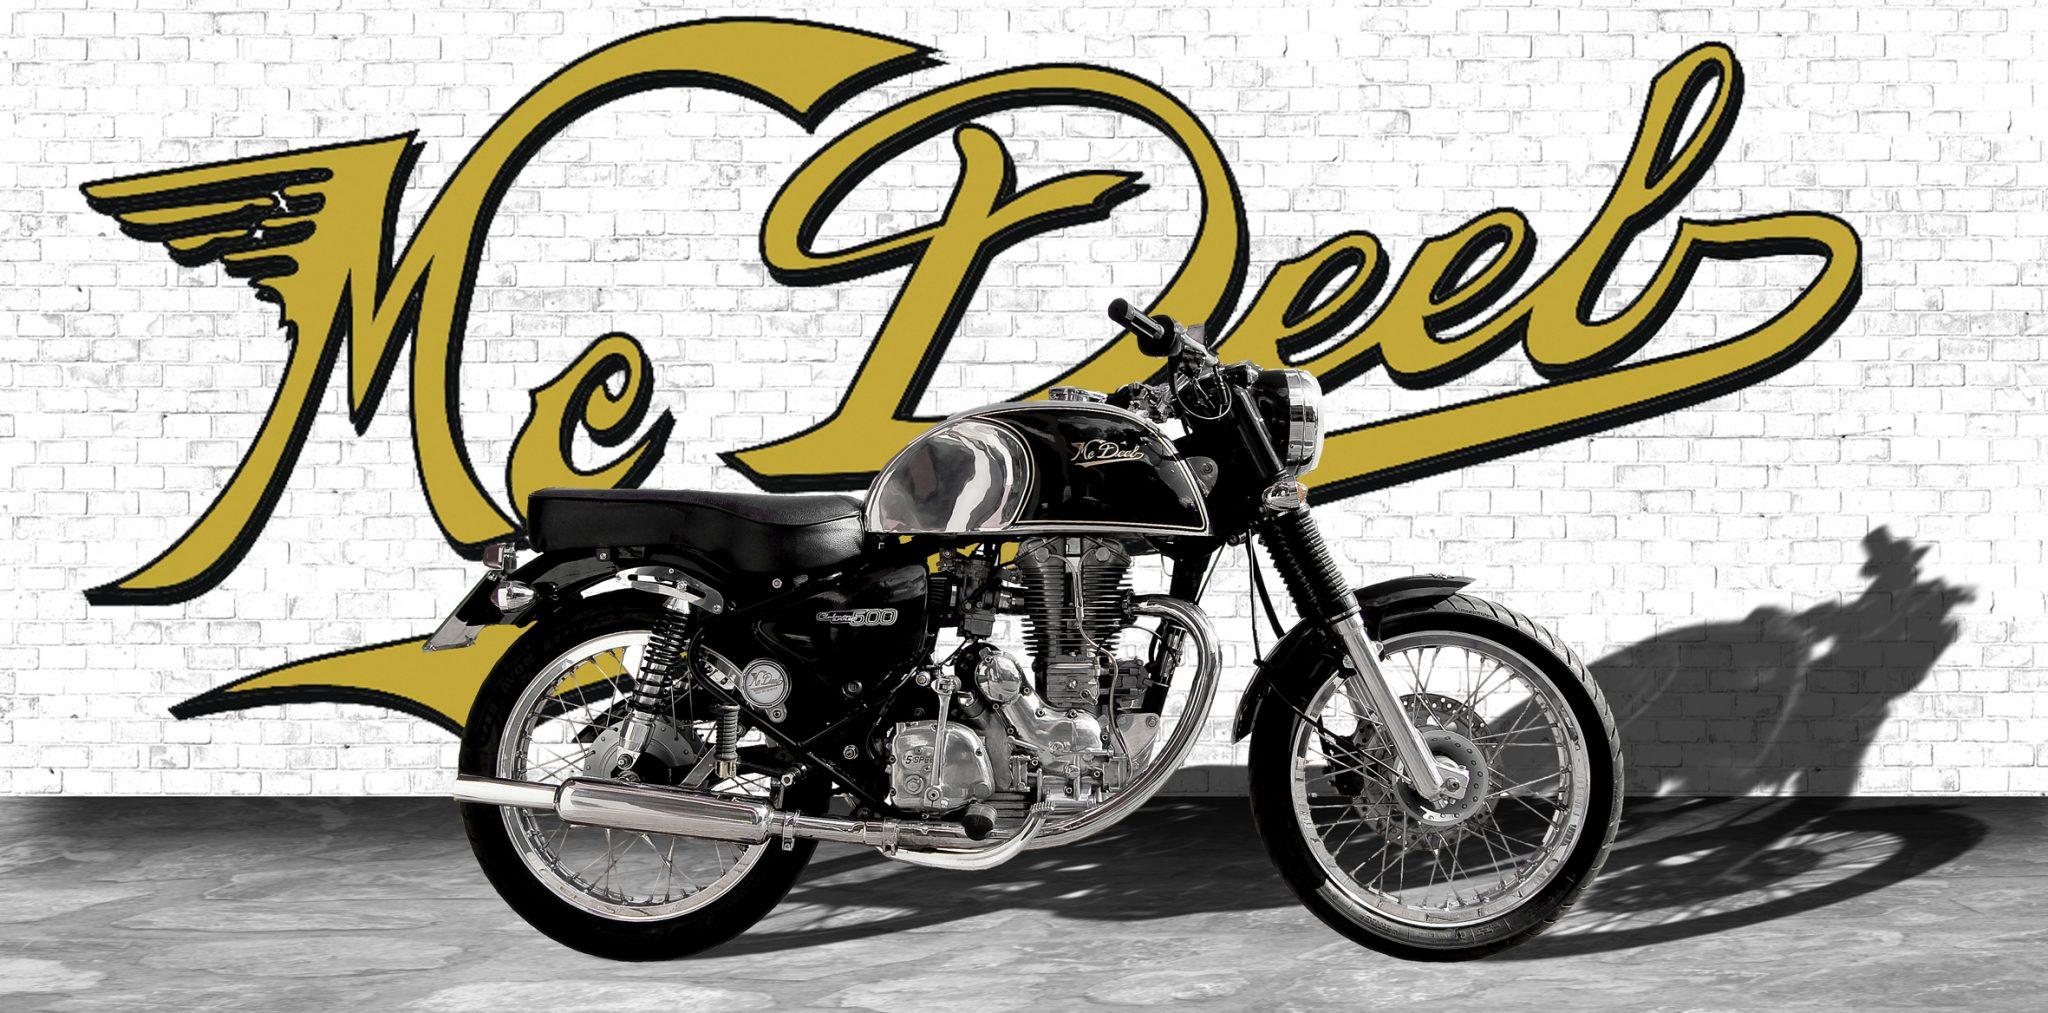 mcdeeb-clubman-superlight-motorcycle